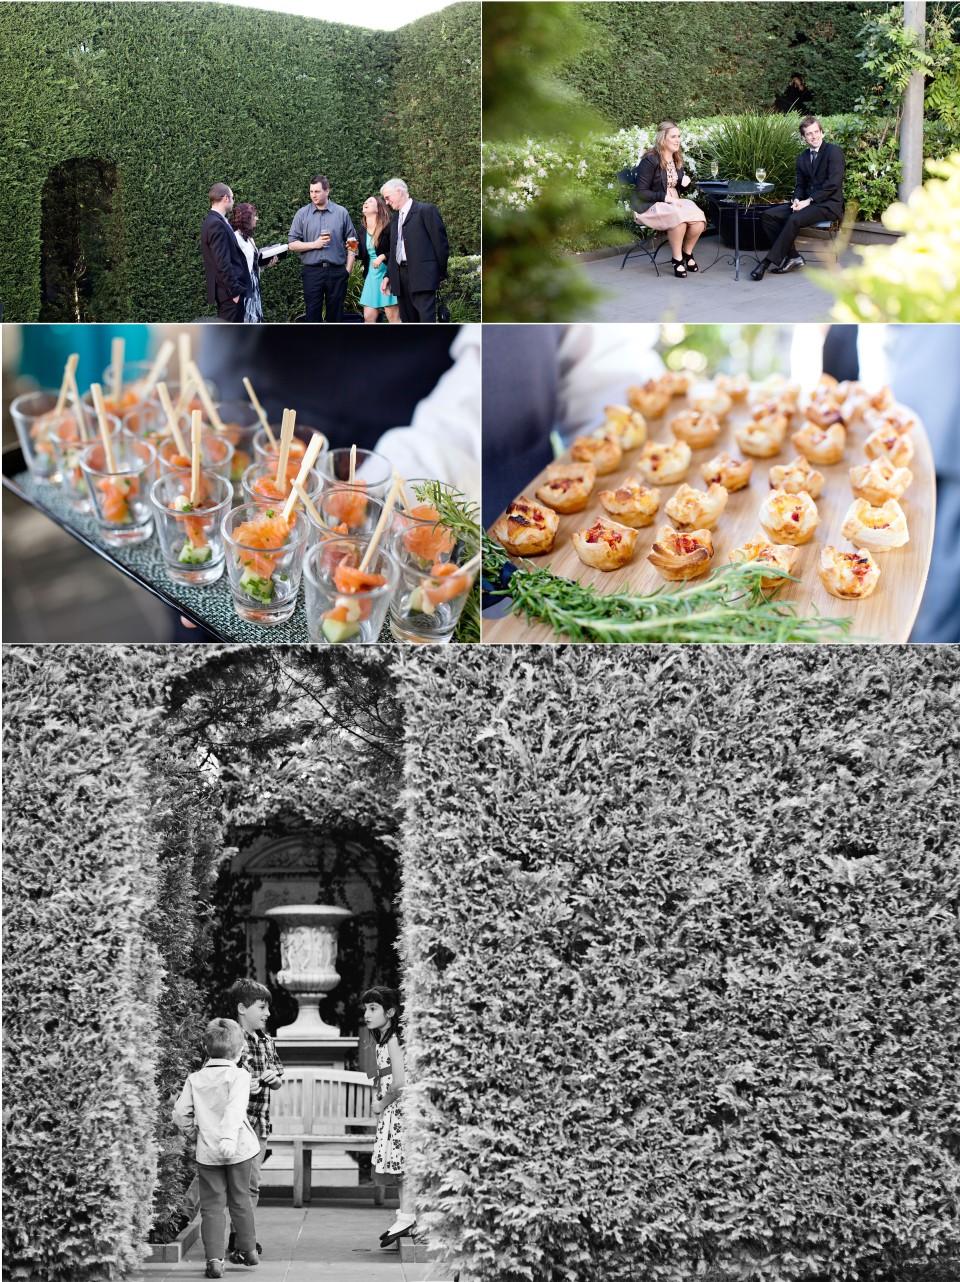 Quat Quatta Wedding Photography, cocktail hour, food